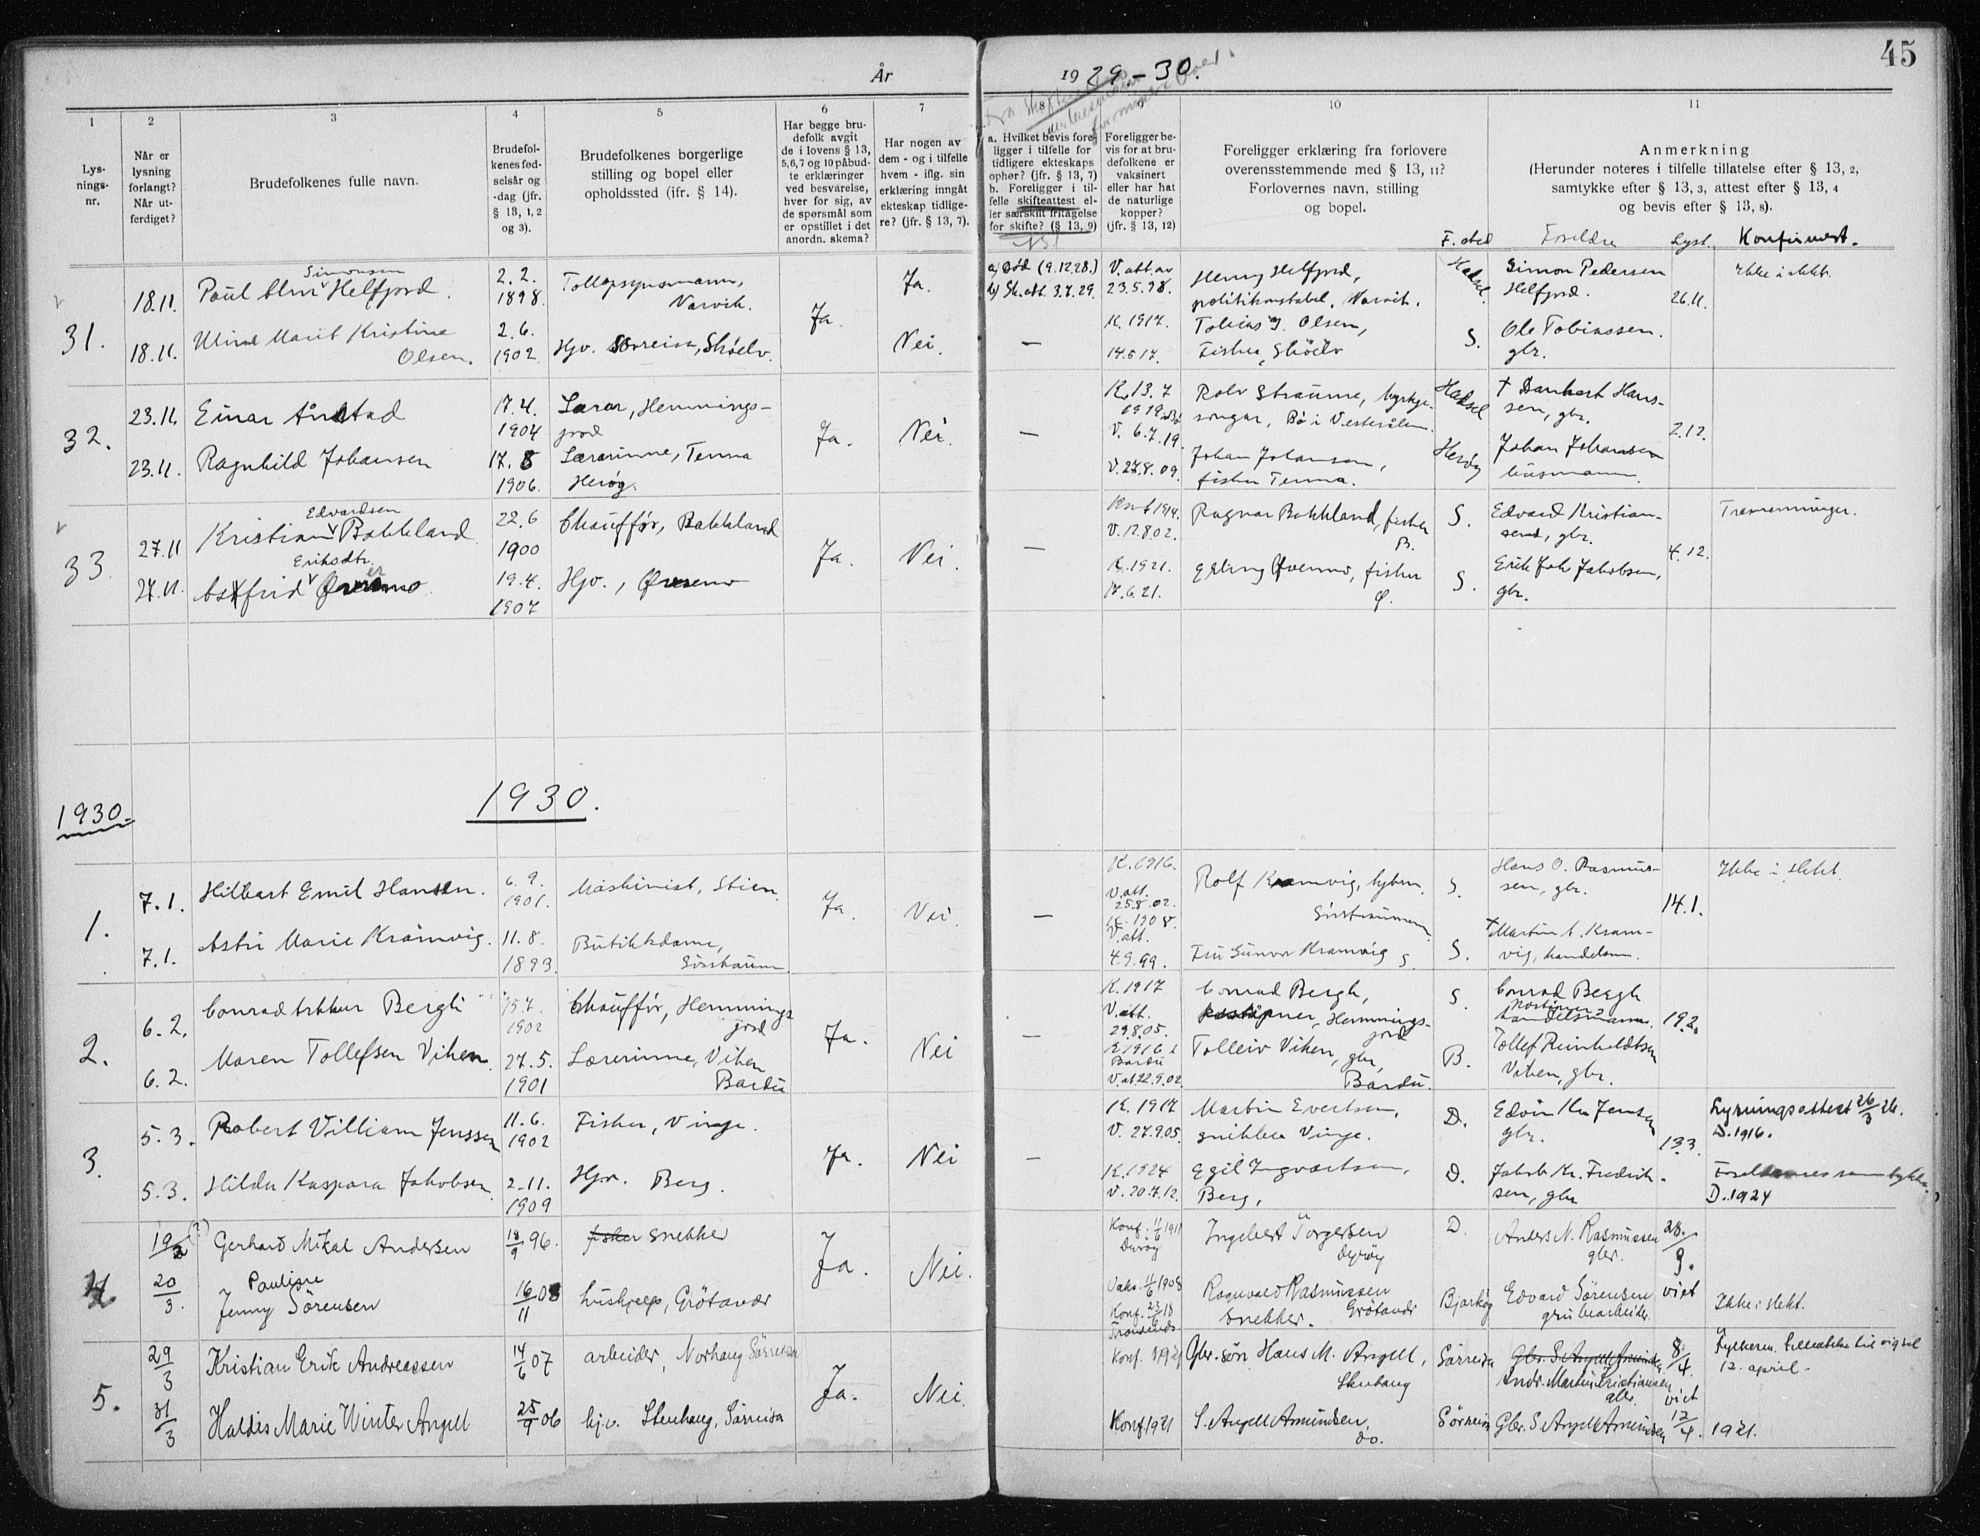 SATØ, Tranøy sokneprestkontor, J/Jc/L0053: Lysningsprotokoll nr. 53, 1919-1940, s. 45